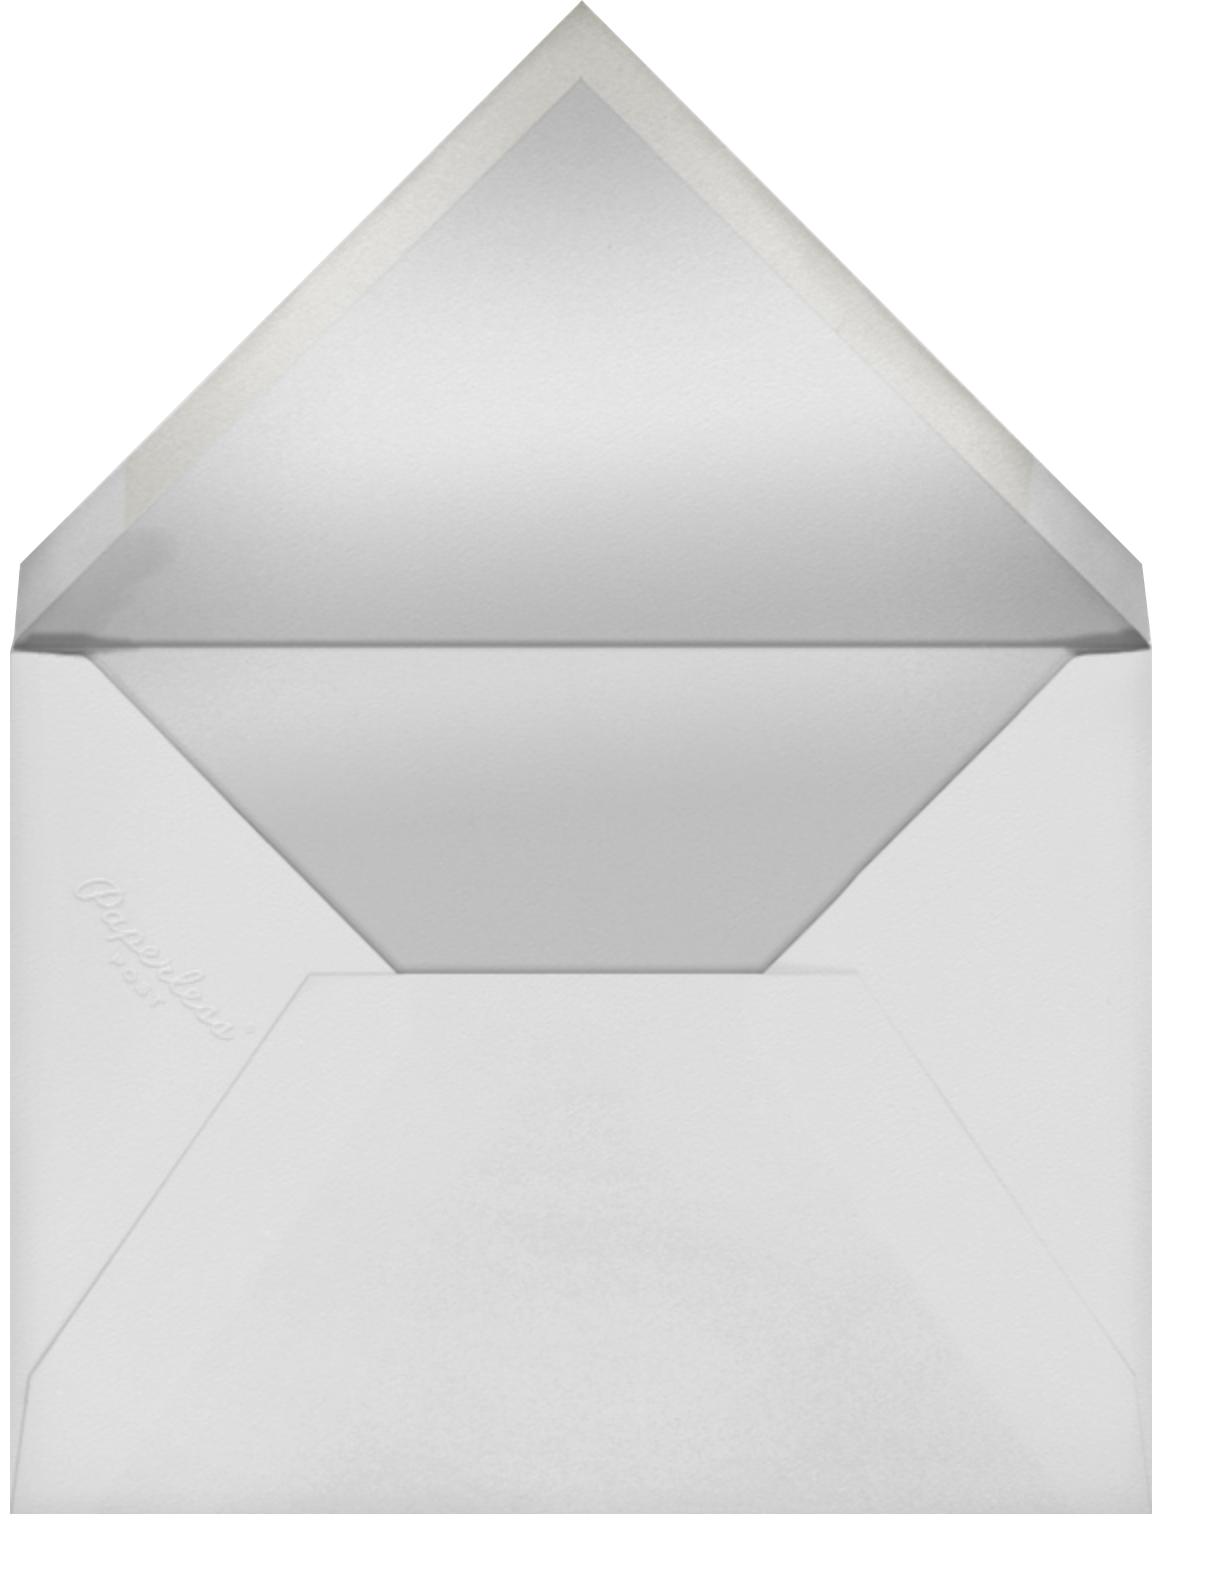 Picnic Table - Paperless Post - Baby shower - envelope back